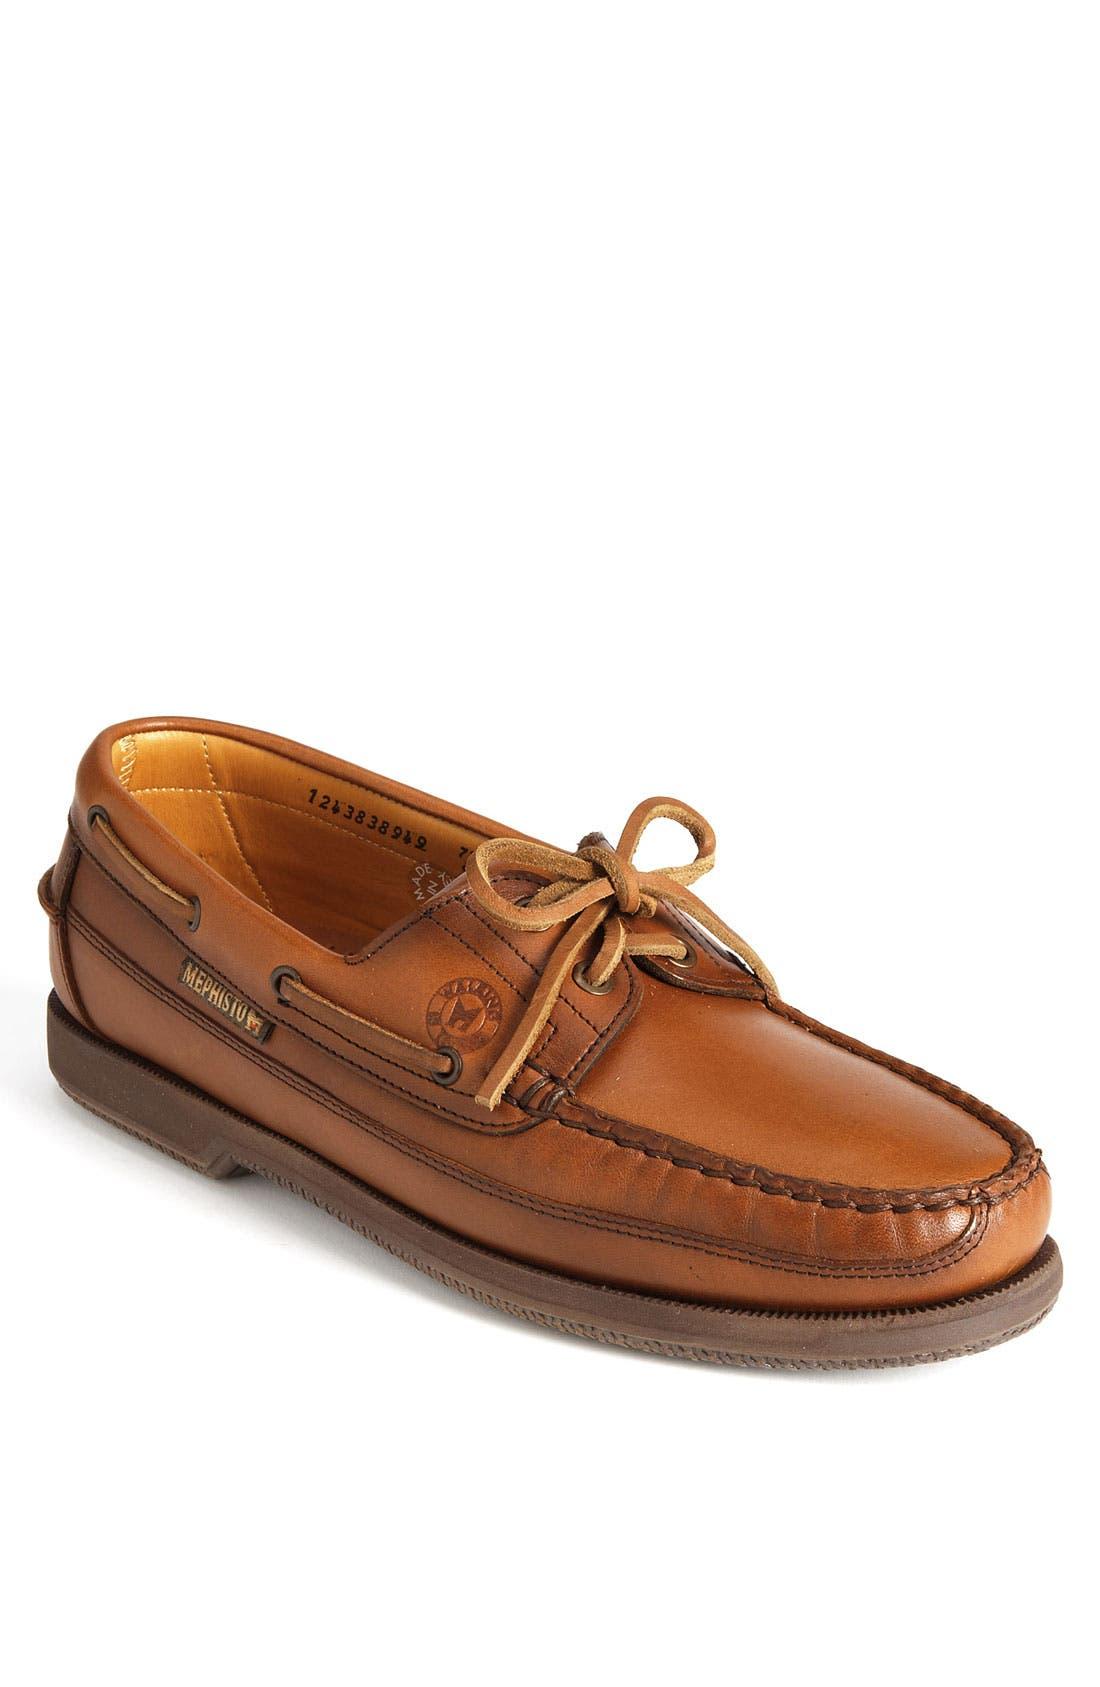 Mephisto 'Hurrikan' Boat Shoe